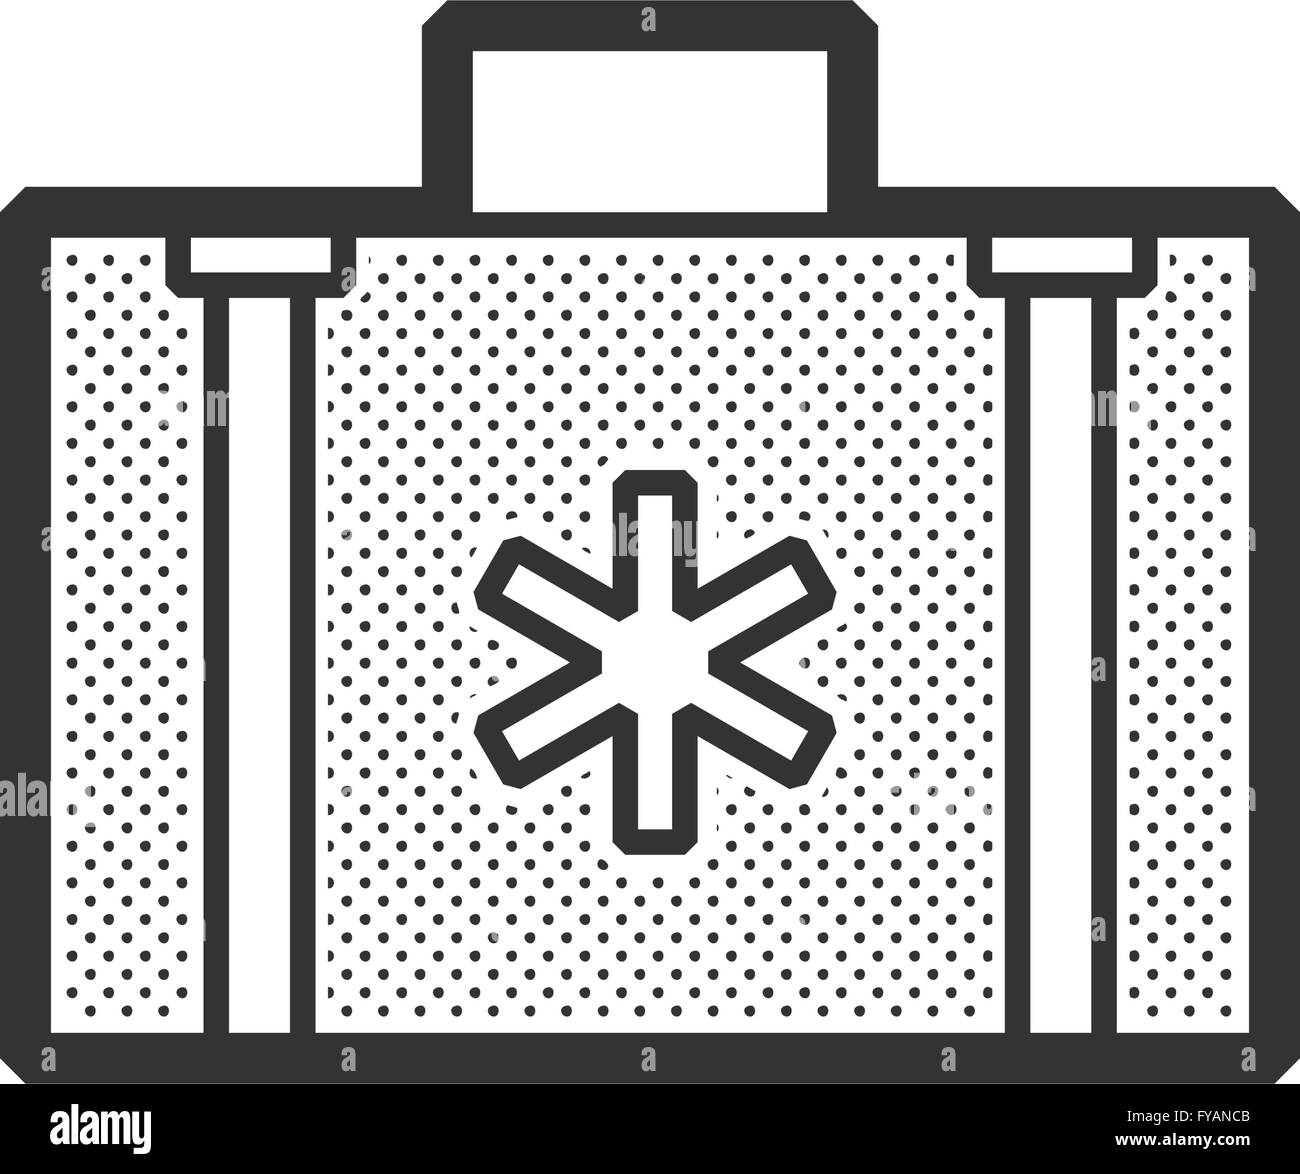 Ambulance Bag Stockfotos & Ambulance Bag Bilder - Alamy